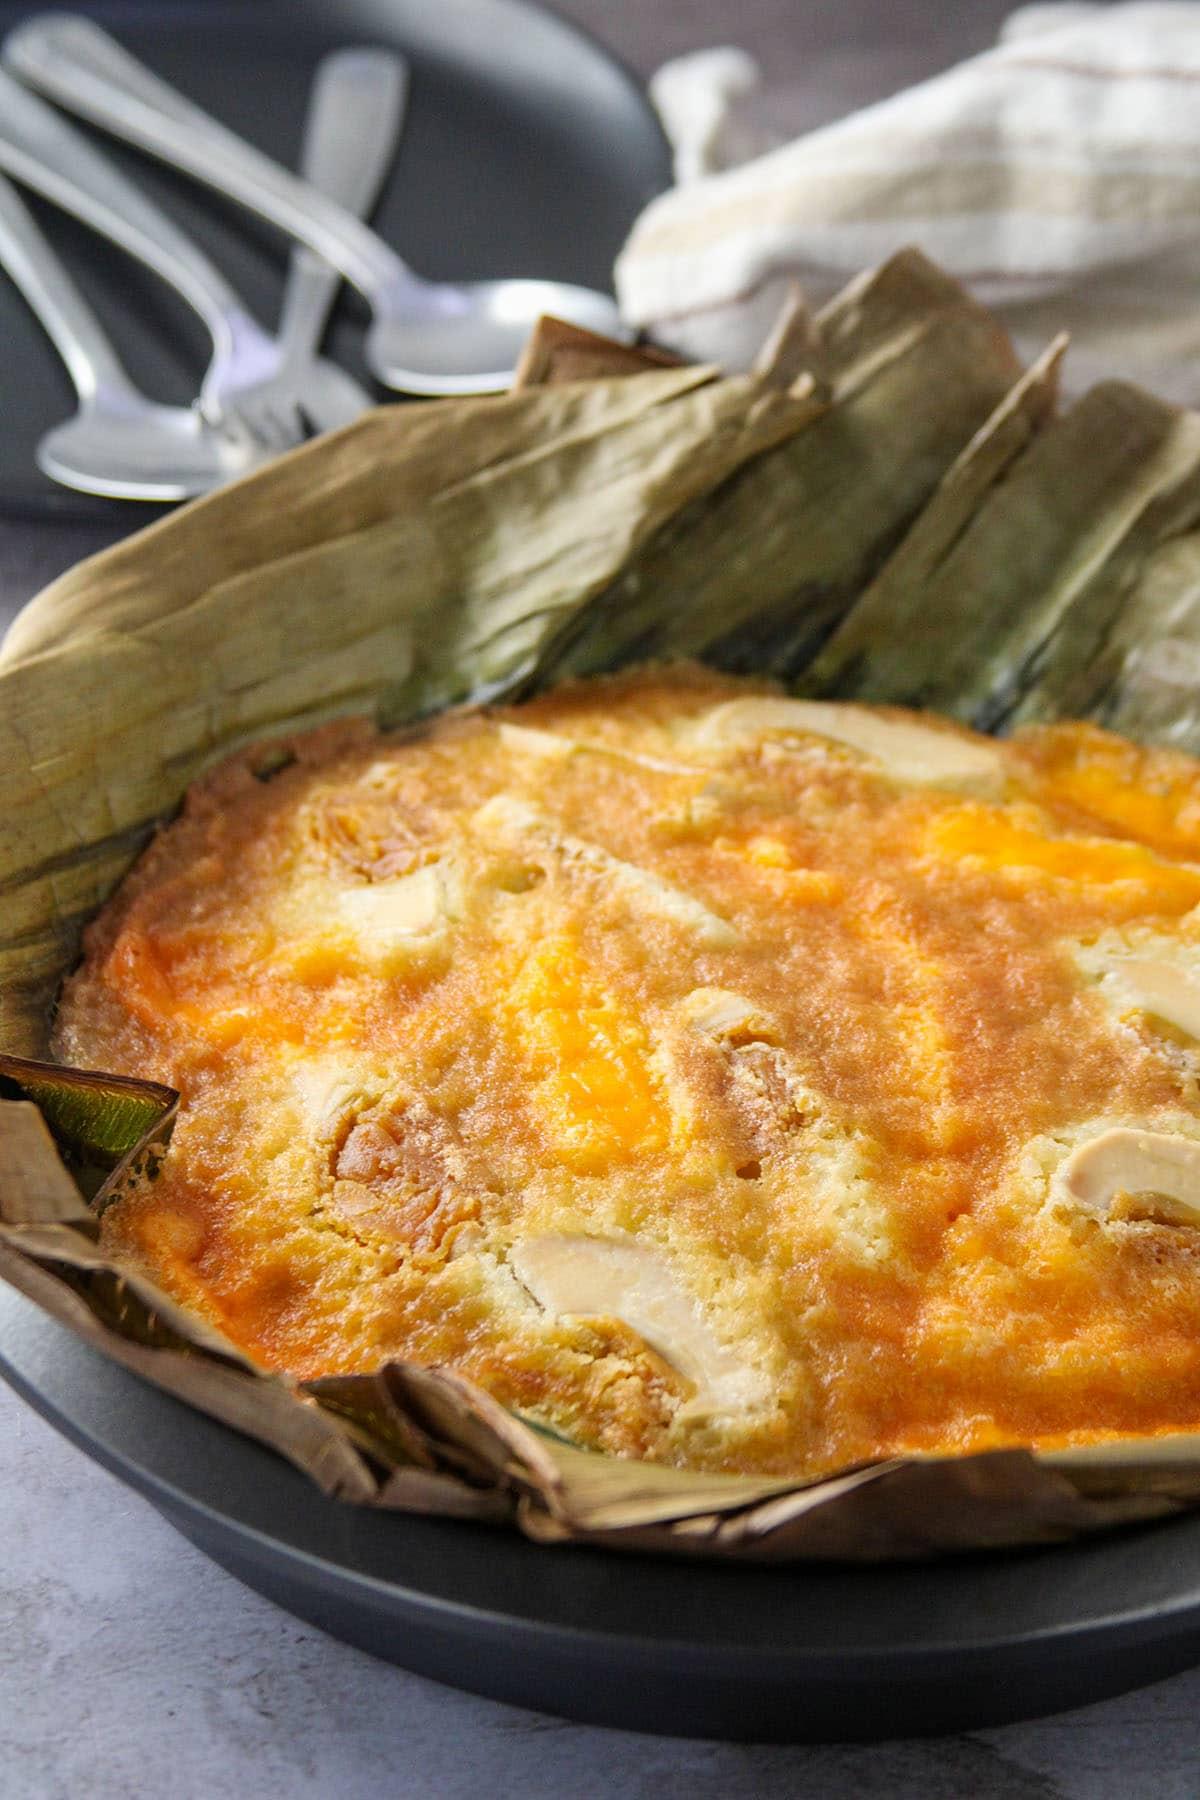 Bibingka in the pan, freshly baked.